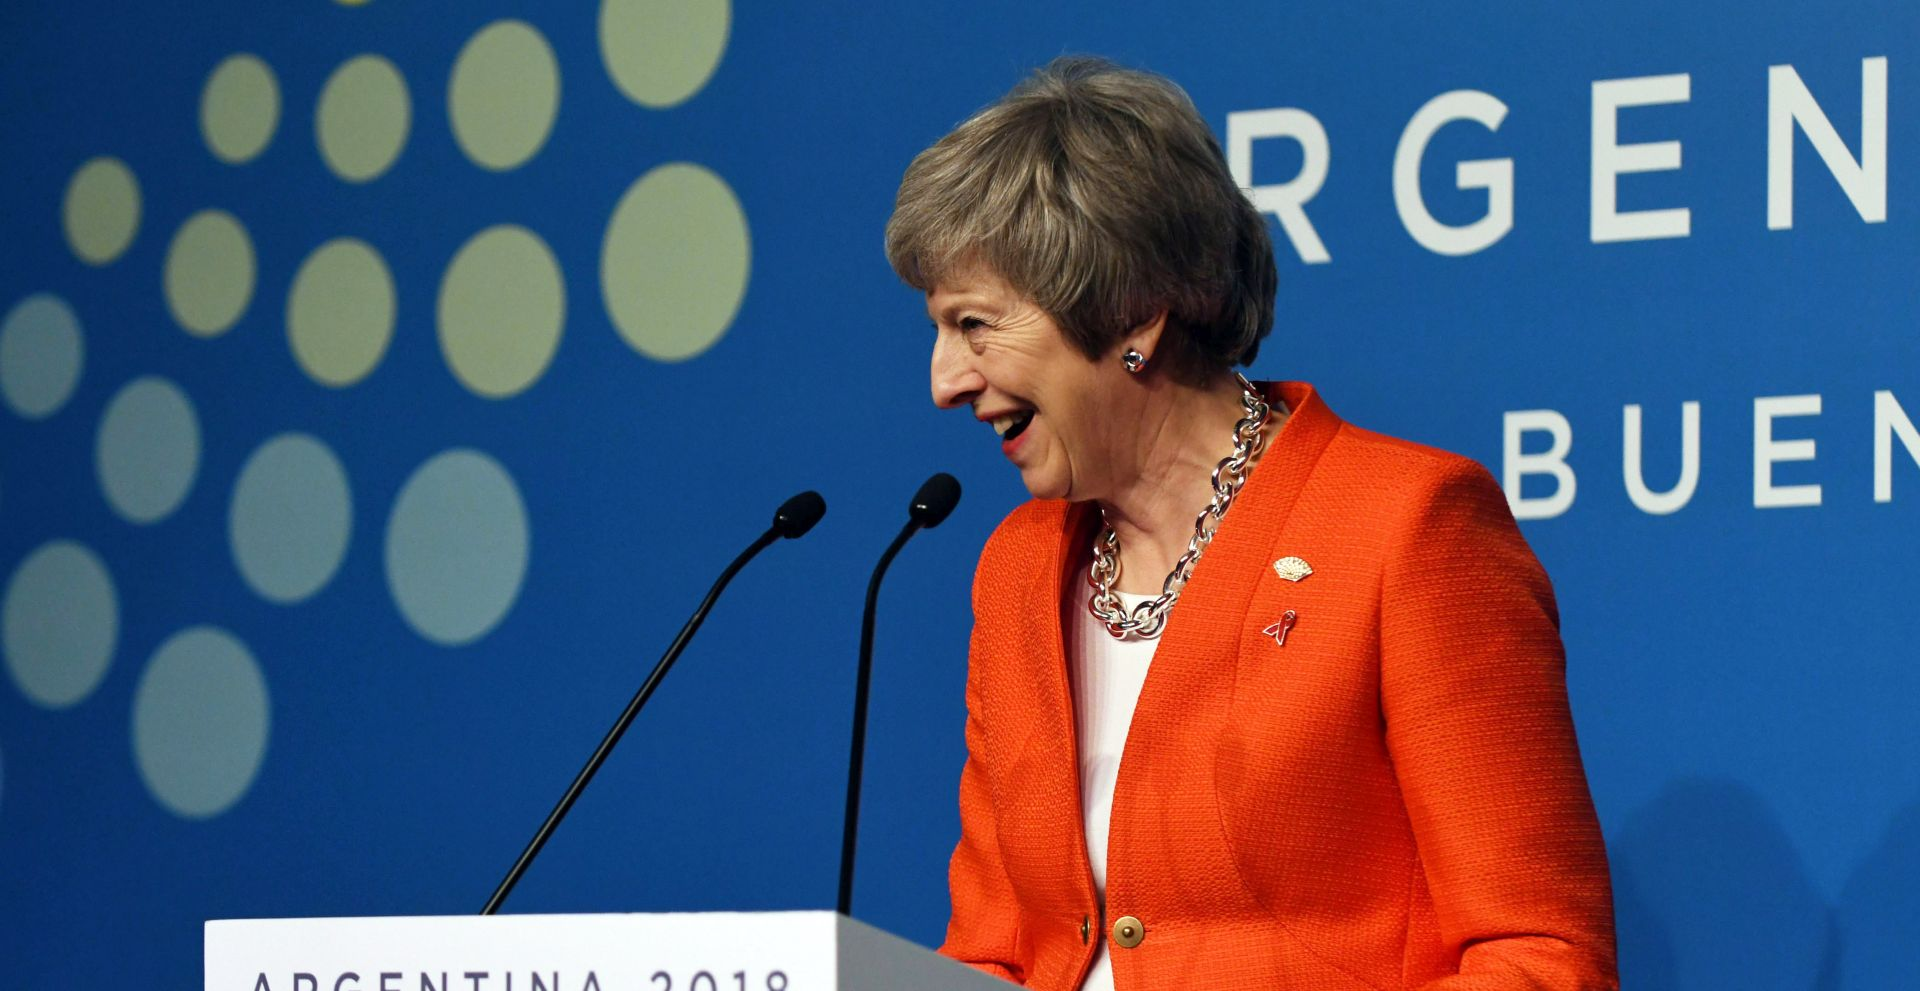 May kreće u petodnevnu raspravu o Brexitu s parlamentom